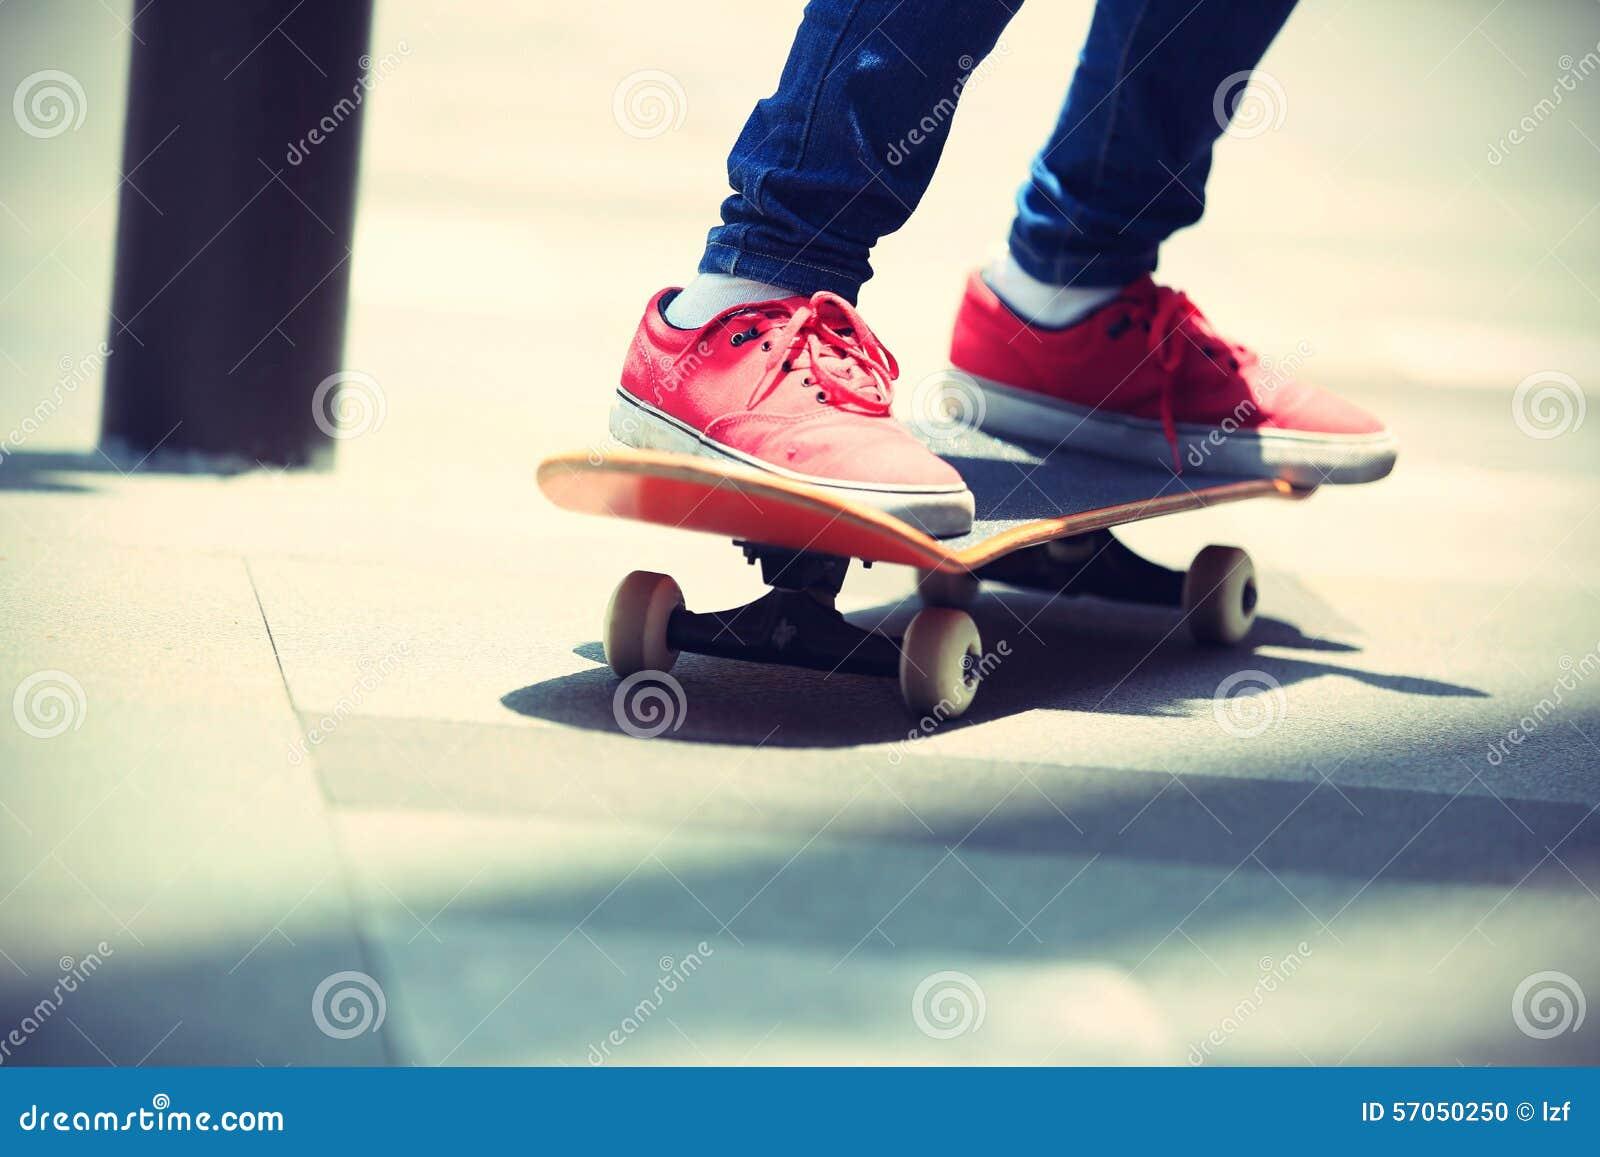 Skateboarderbenen die op skateboard op stad berijden